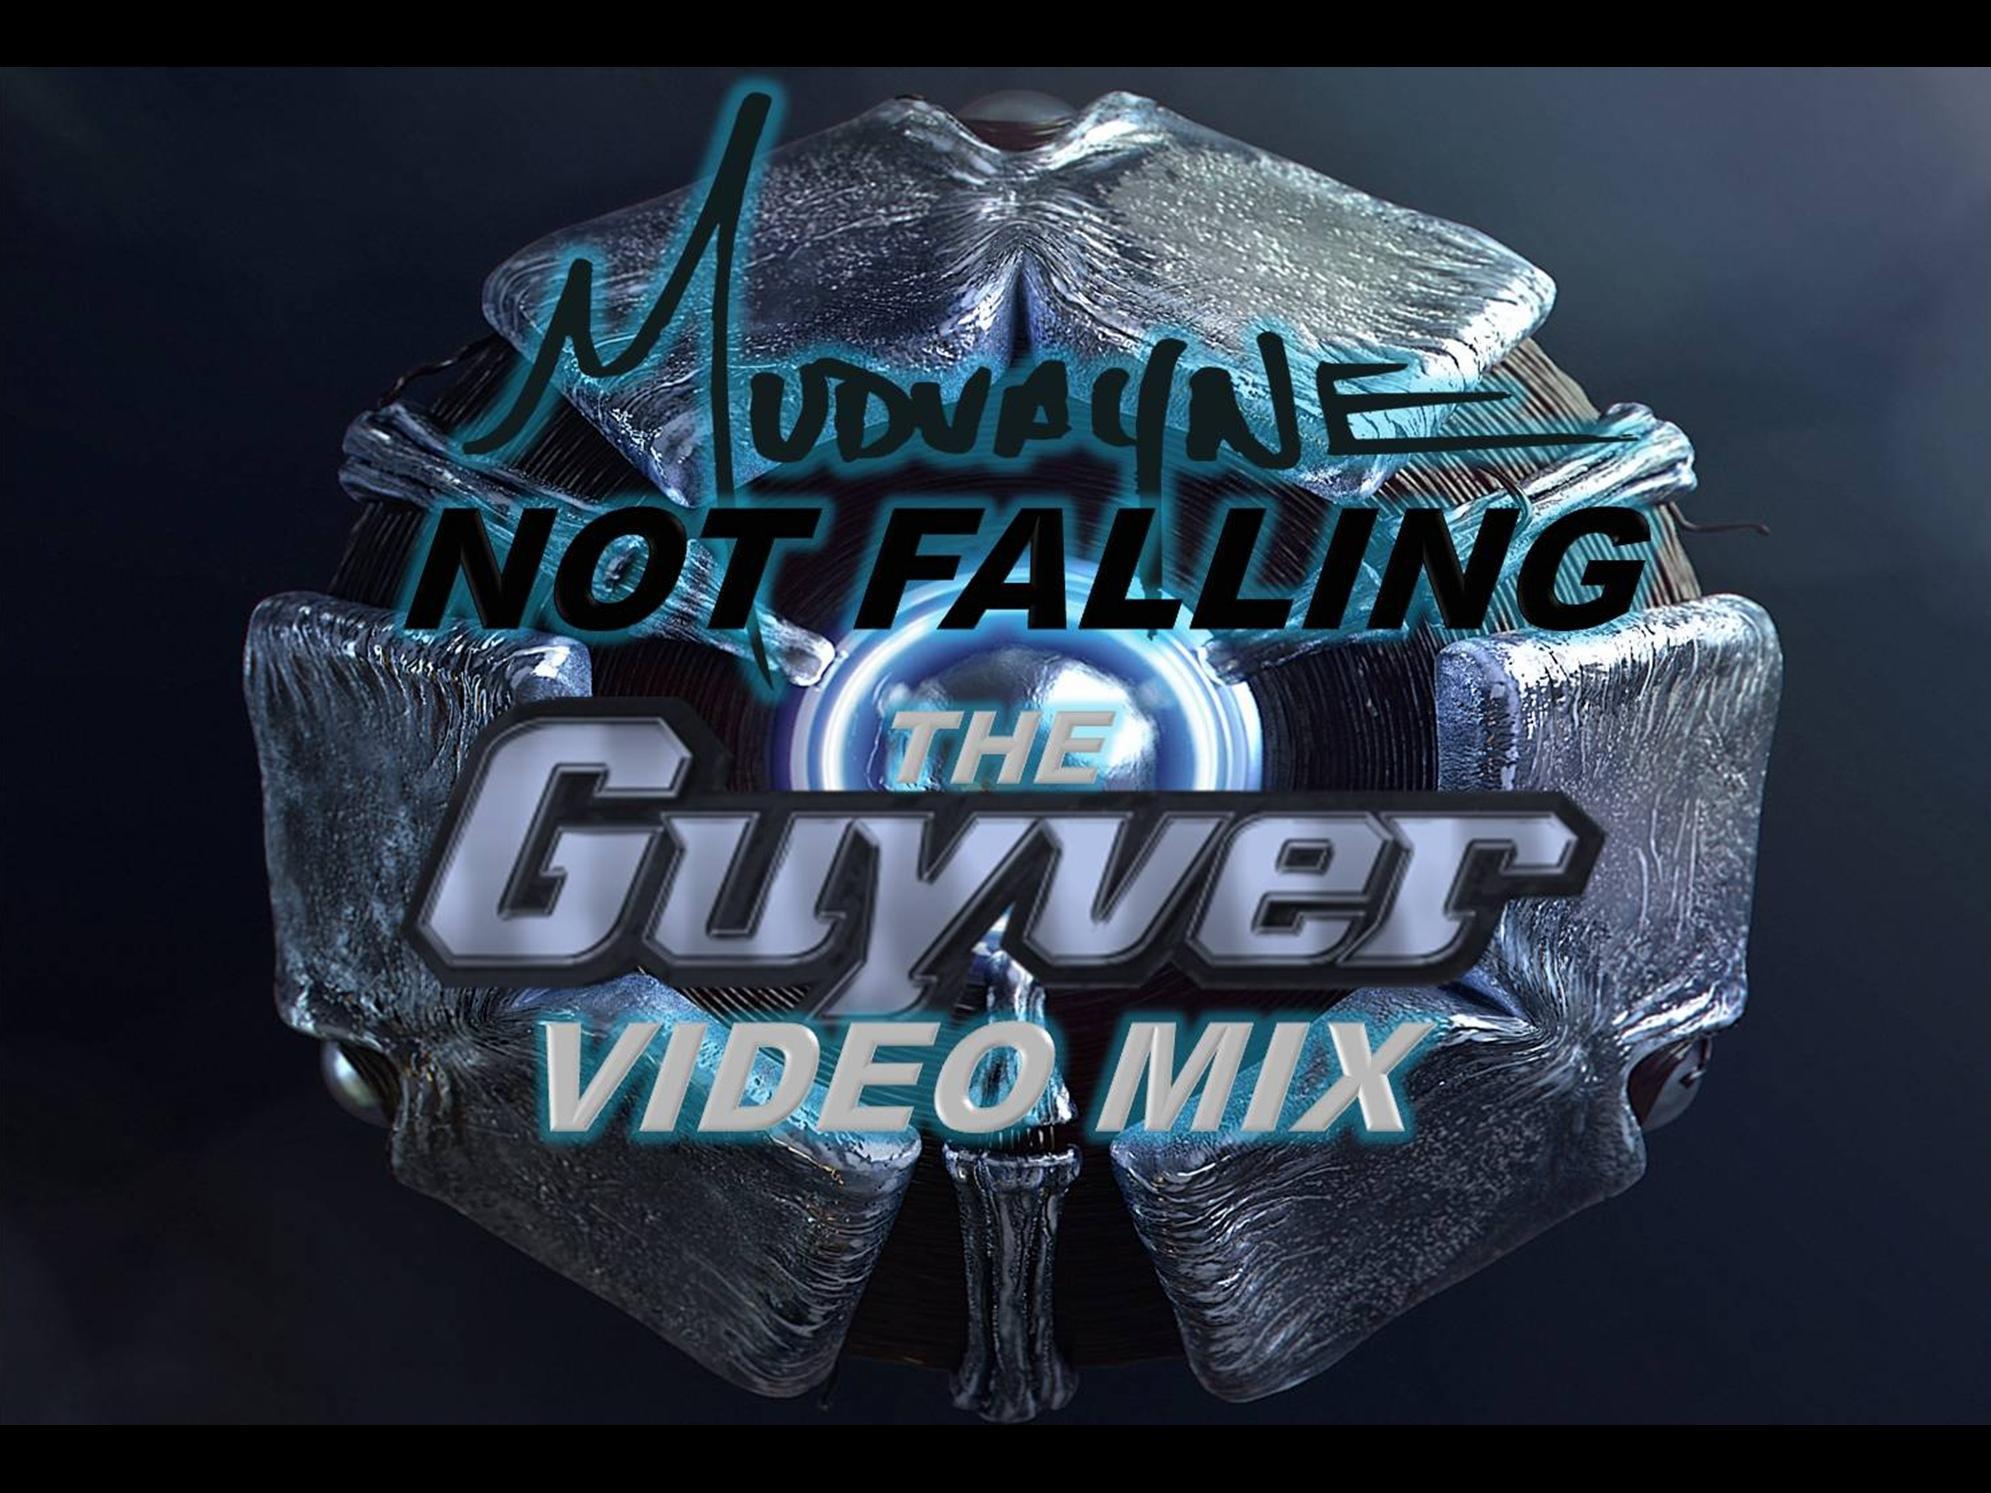 Mudvayne-_Not_Falling_(The_Guyver_Video_Mix)